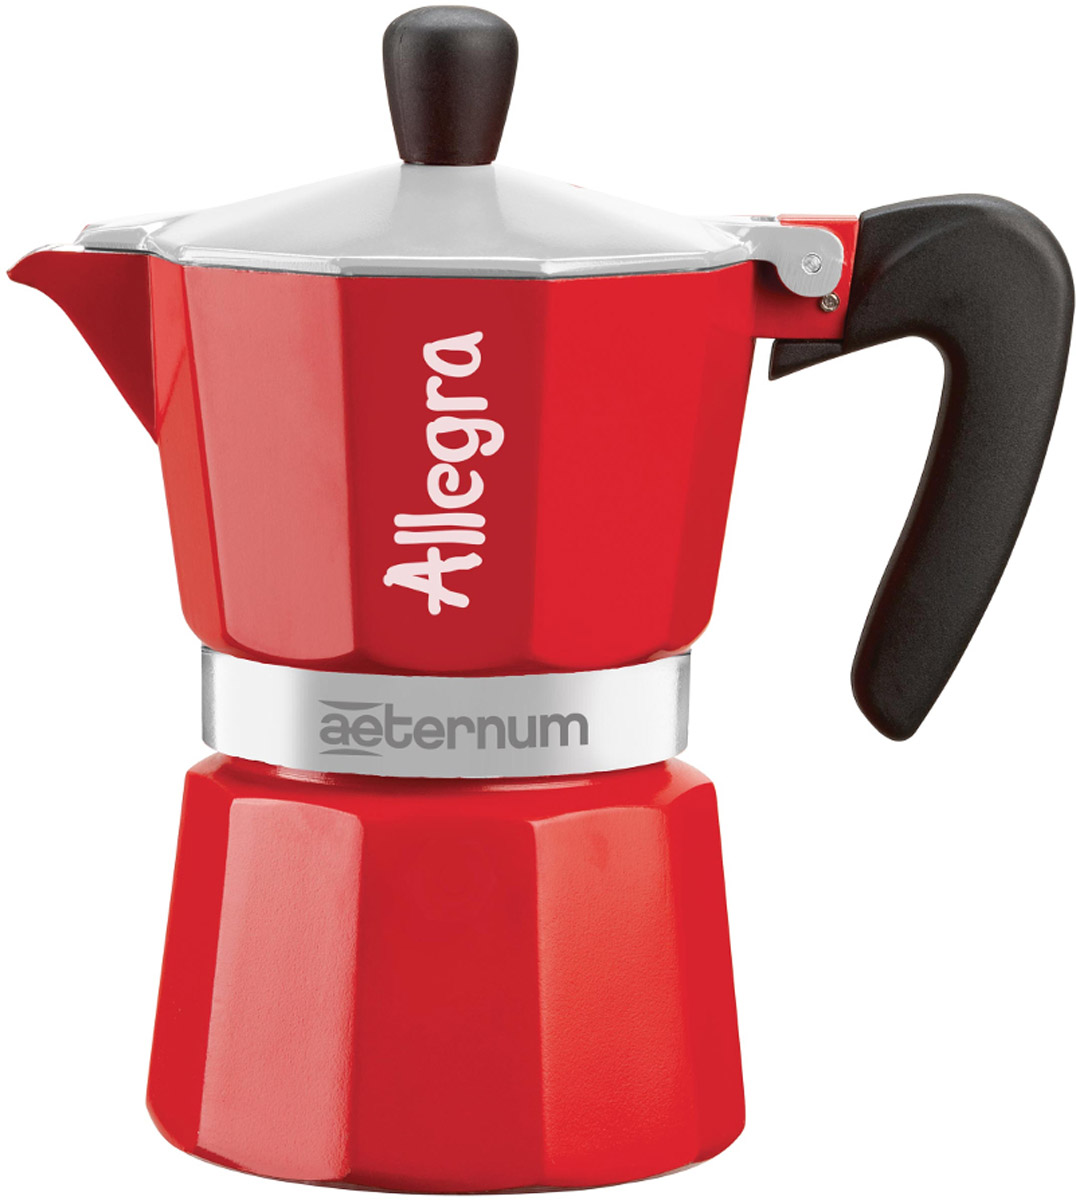 Кофеварка гейзерная Bialetti Aeternum Allegra, цвет: красный, на 3 чашки